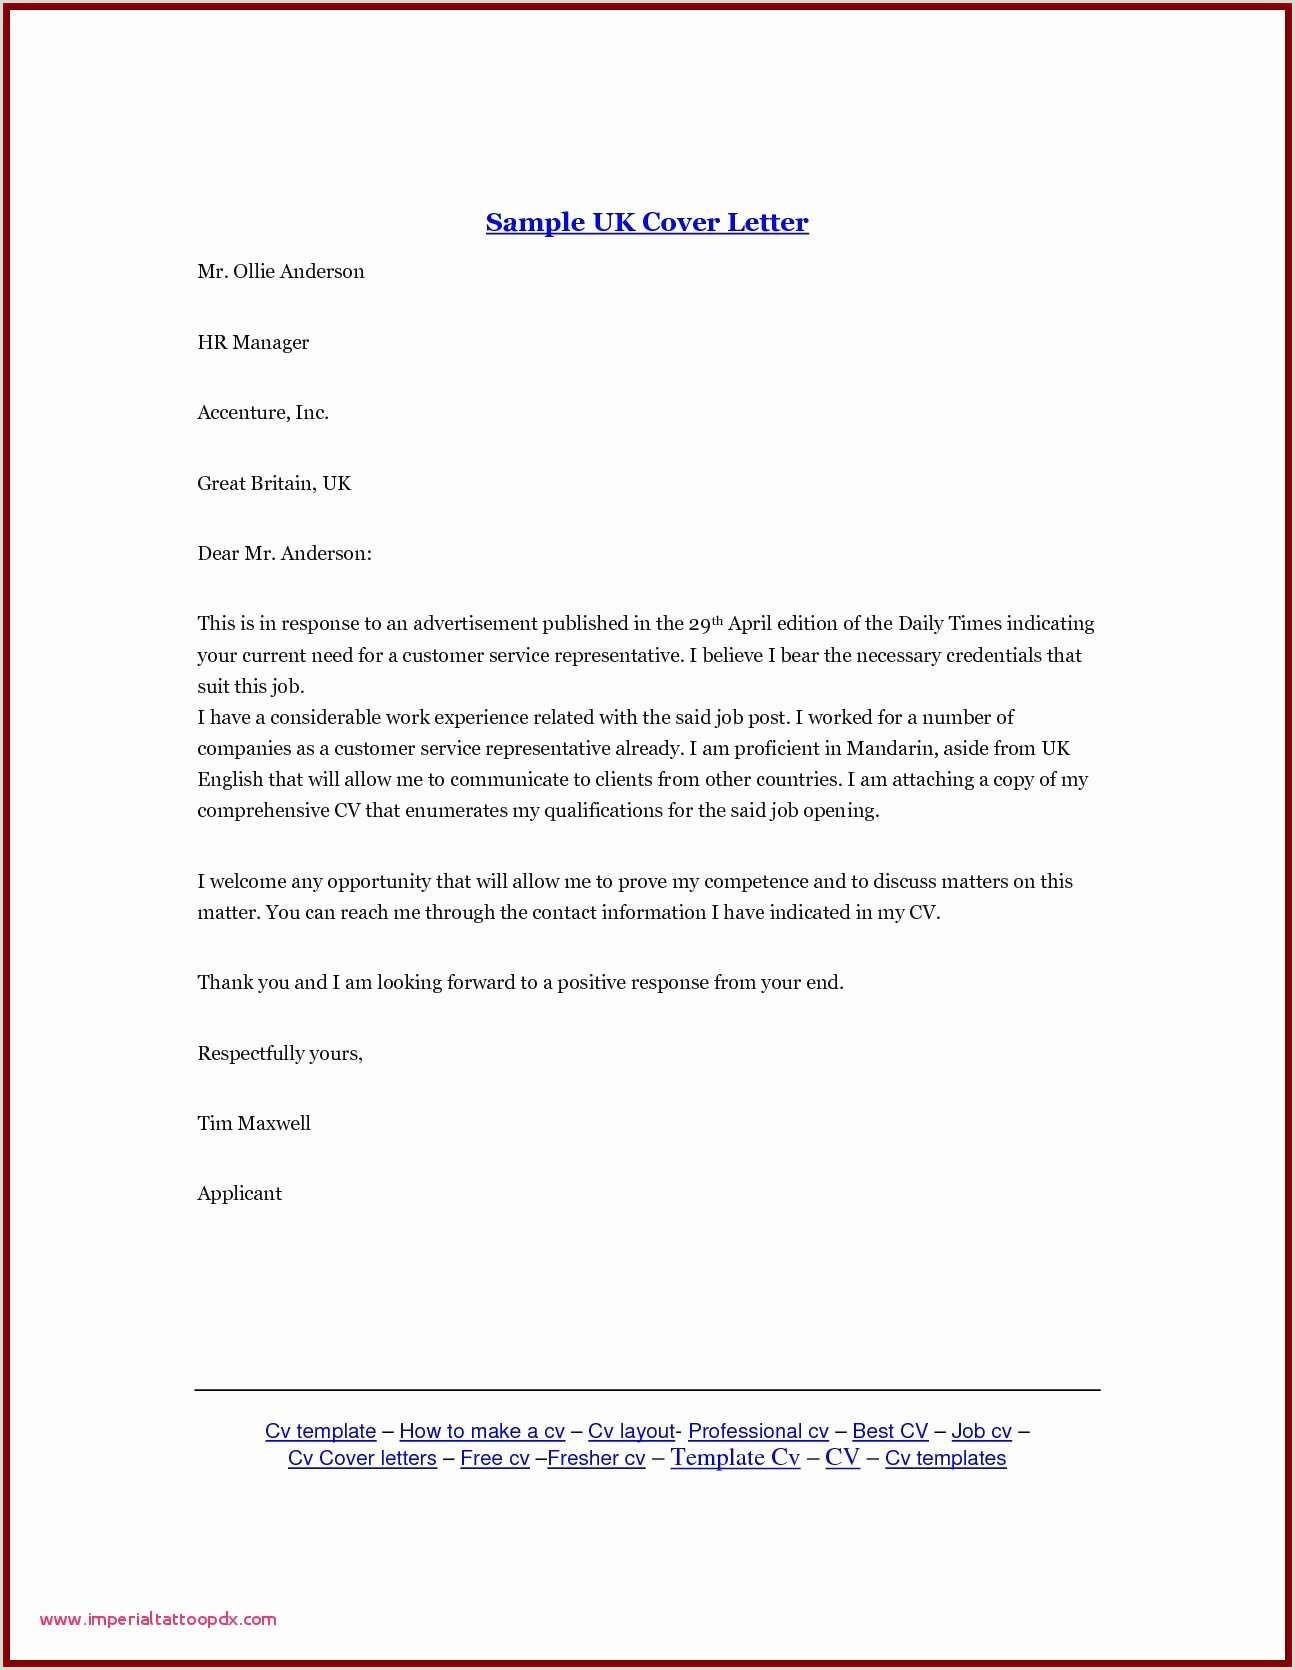 Ca Fresher Cv format Sample Resume Declaration format Valid Resume Personal